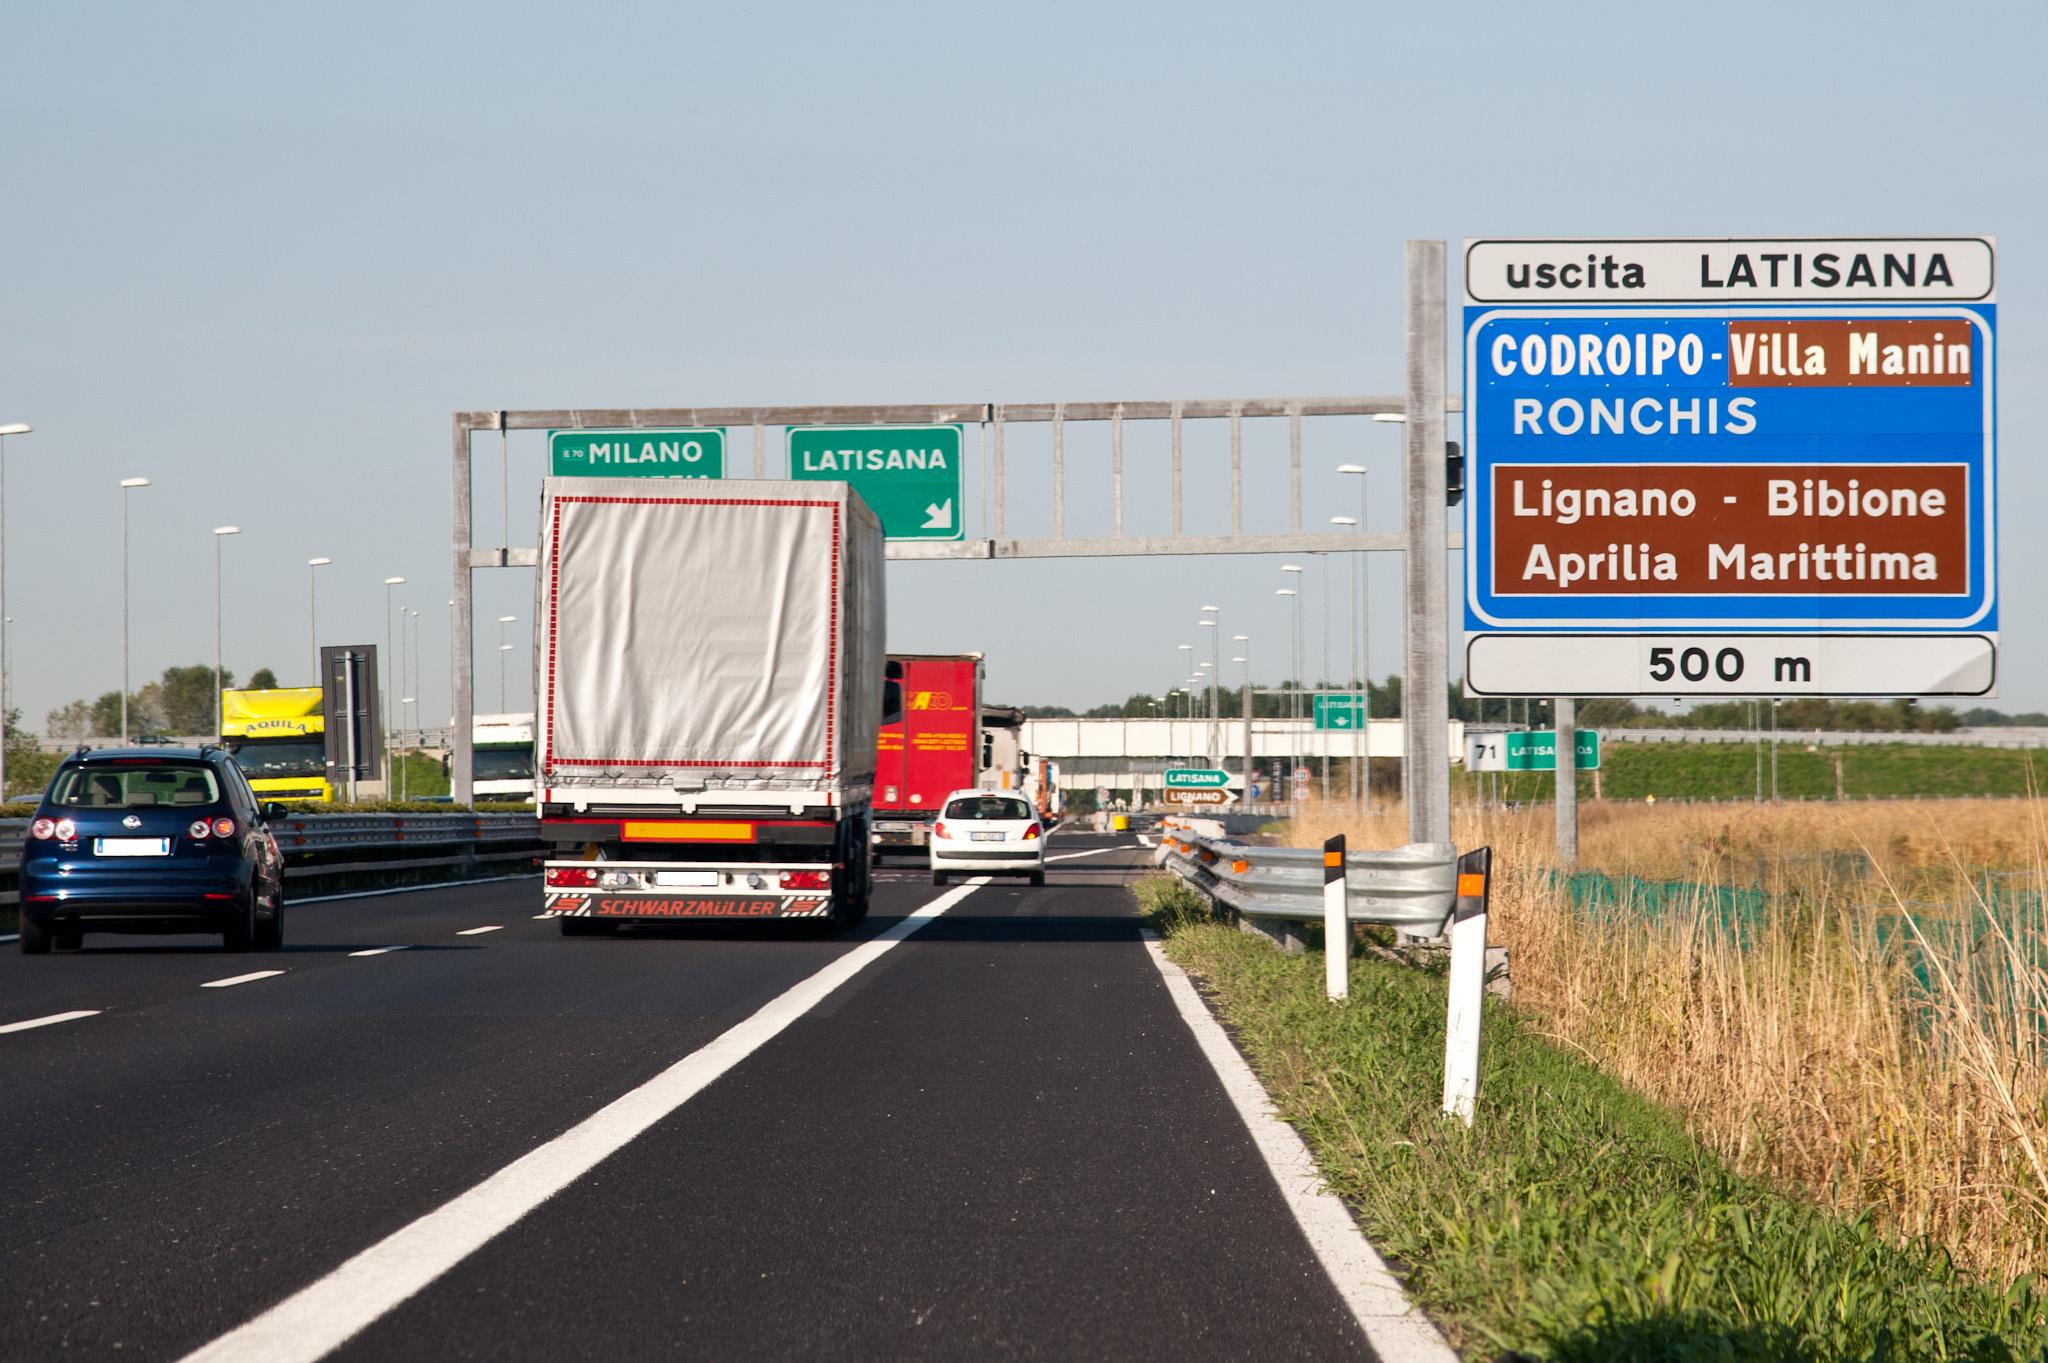 Autostrada svincolo Latisana